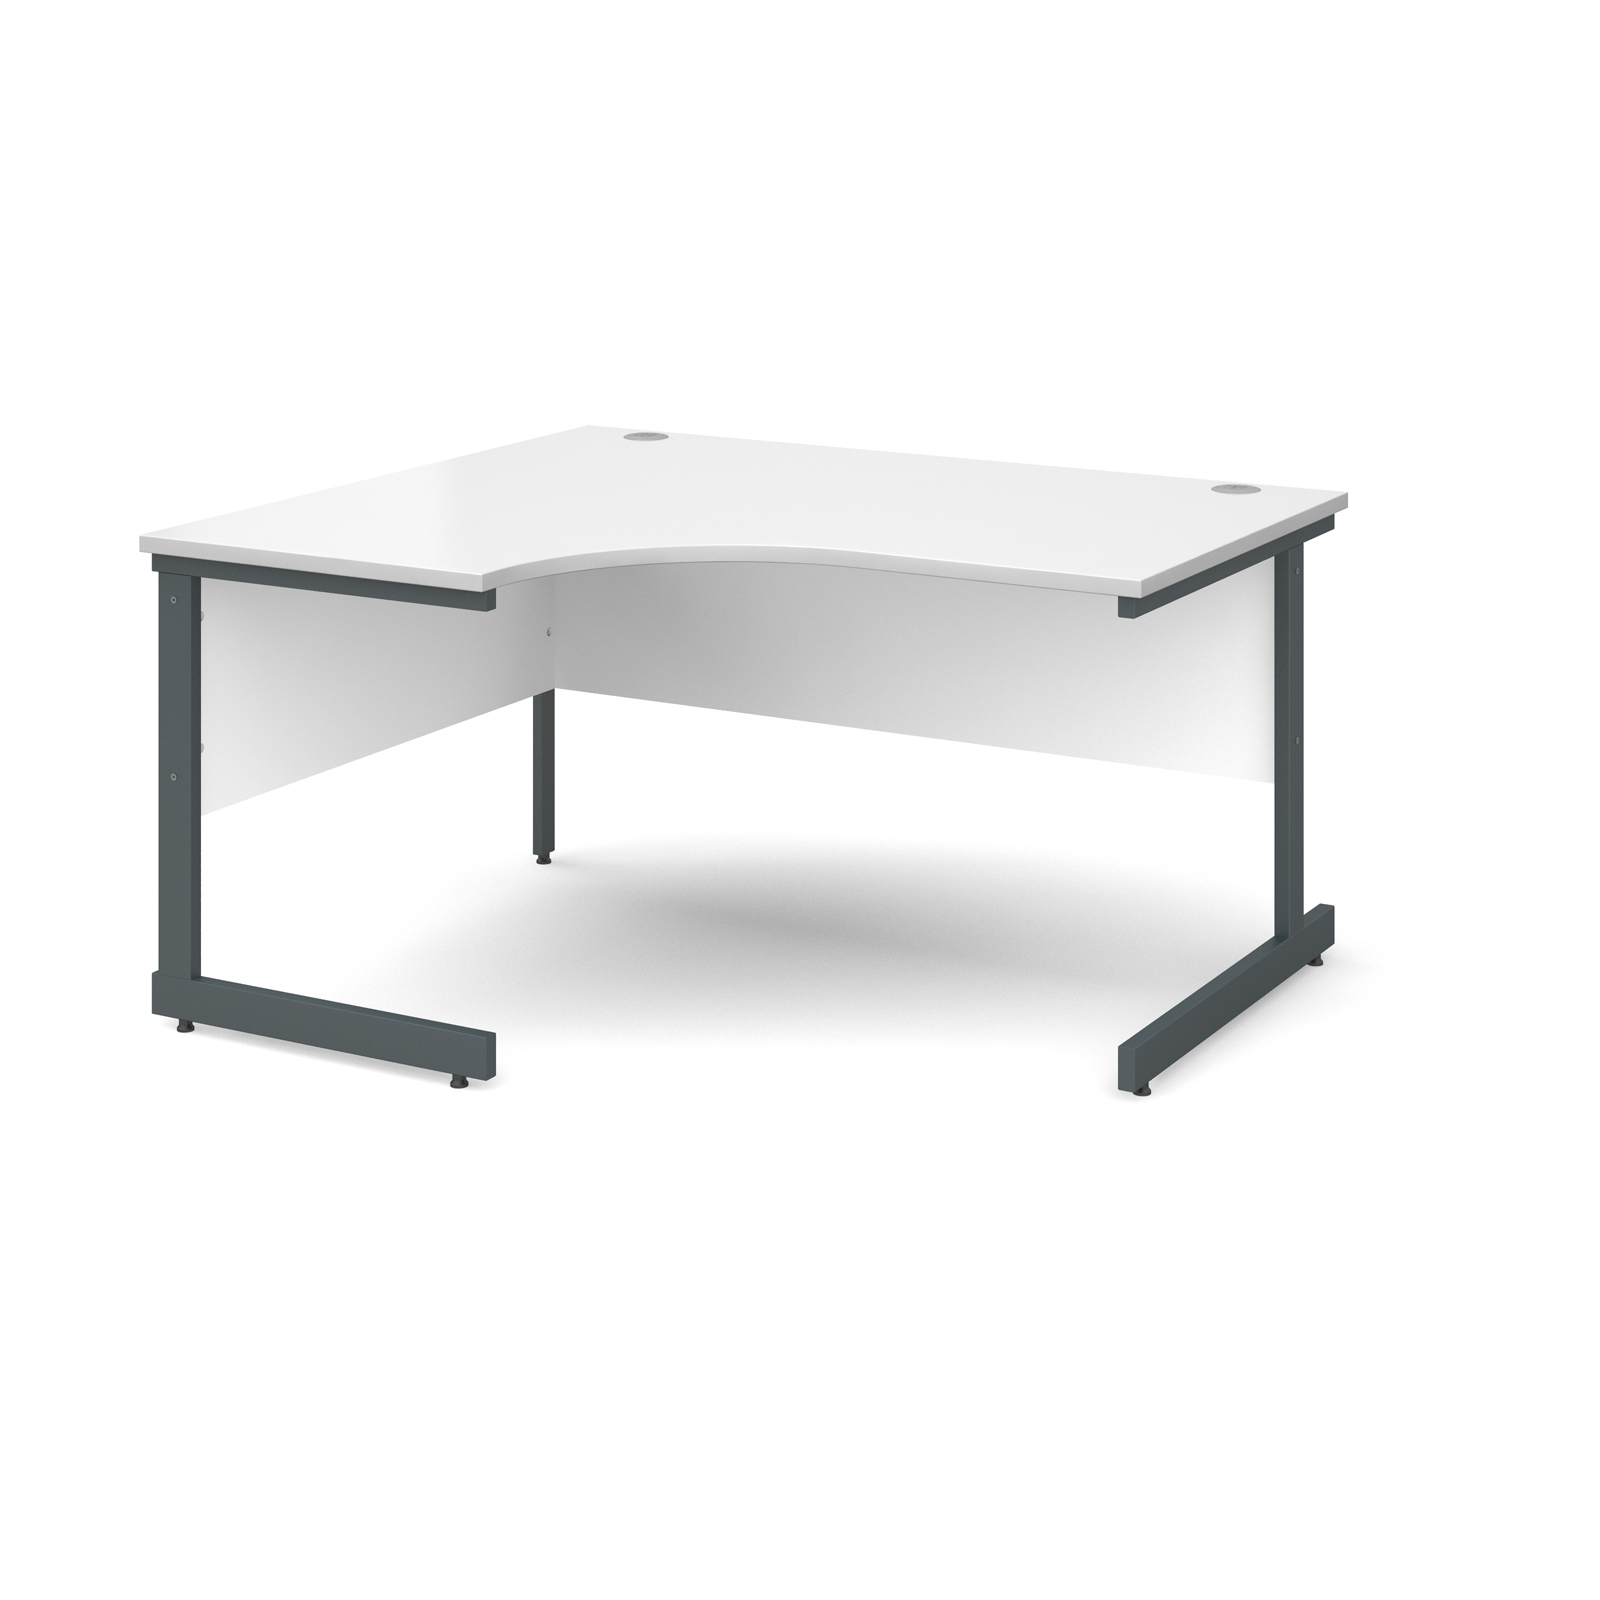 Contract 25 left hand ergonomic desk 1400mm - graphite cantilever frame, white top